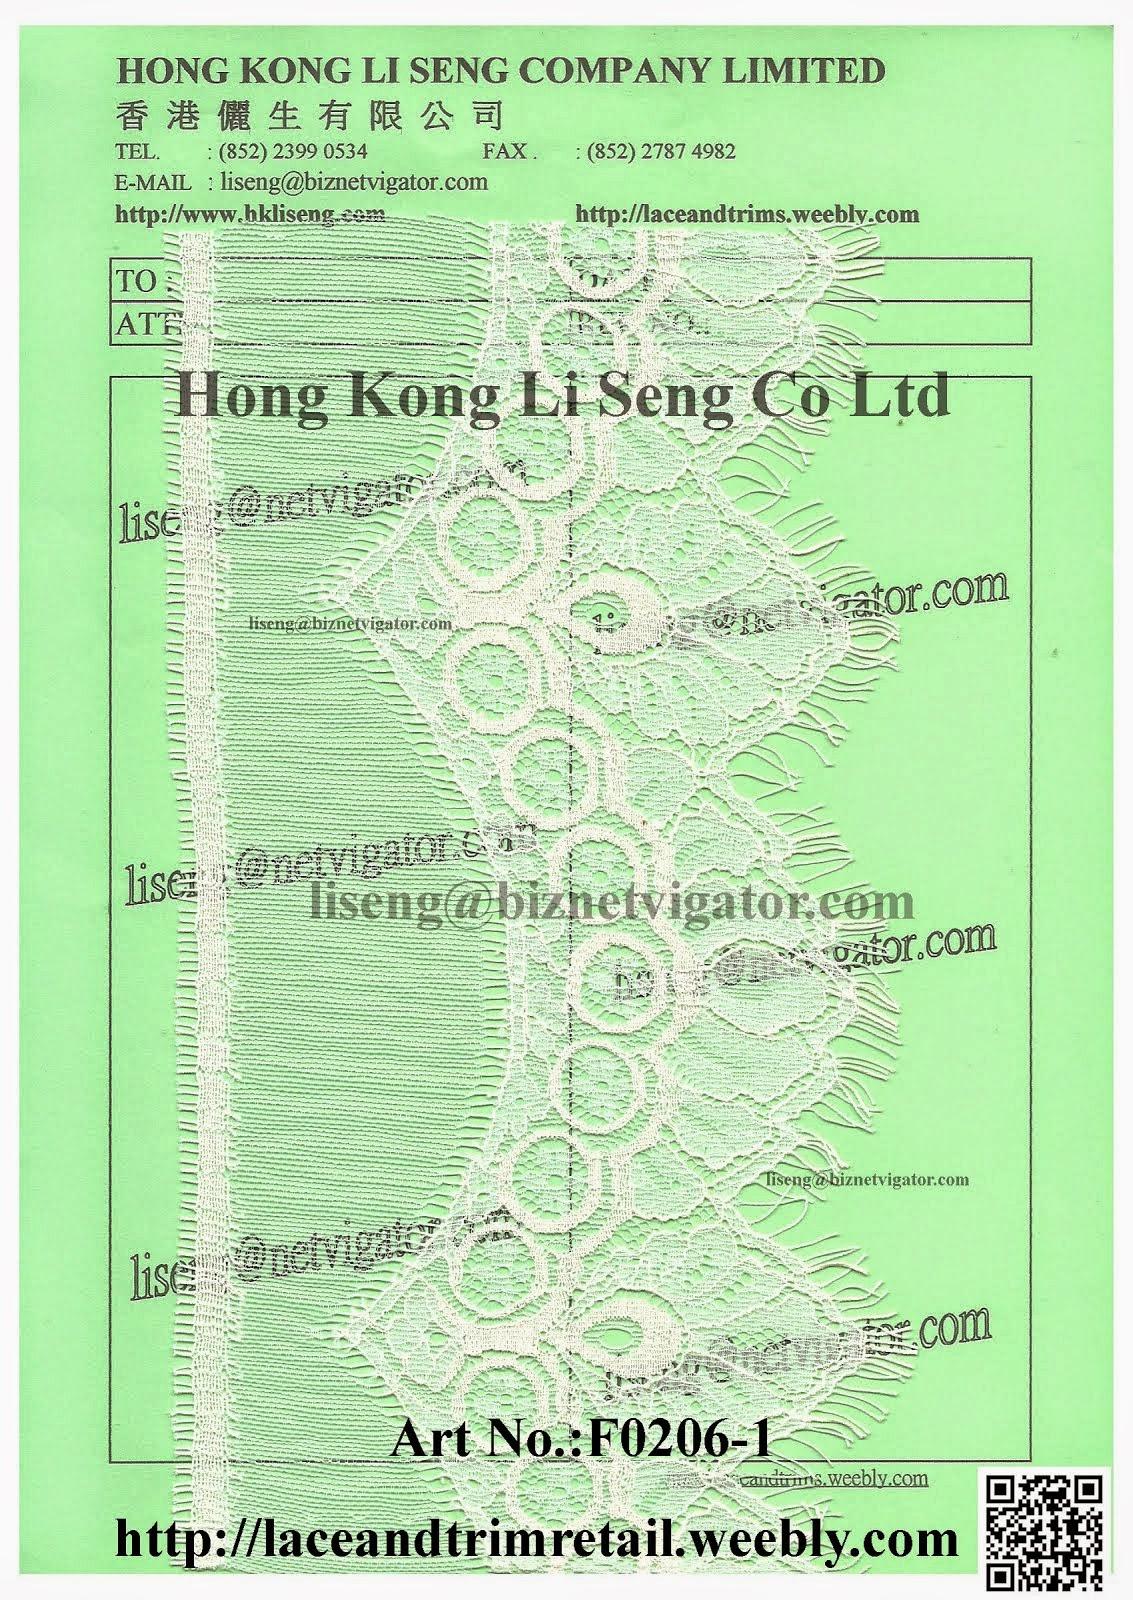 Producing Eyelash Lace Pattern - Hong Kong Li Seng Co Ltd